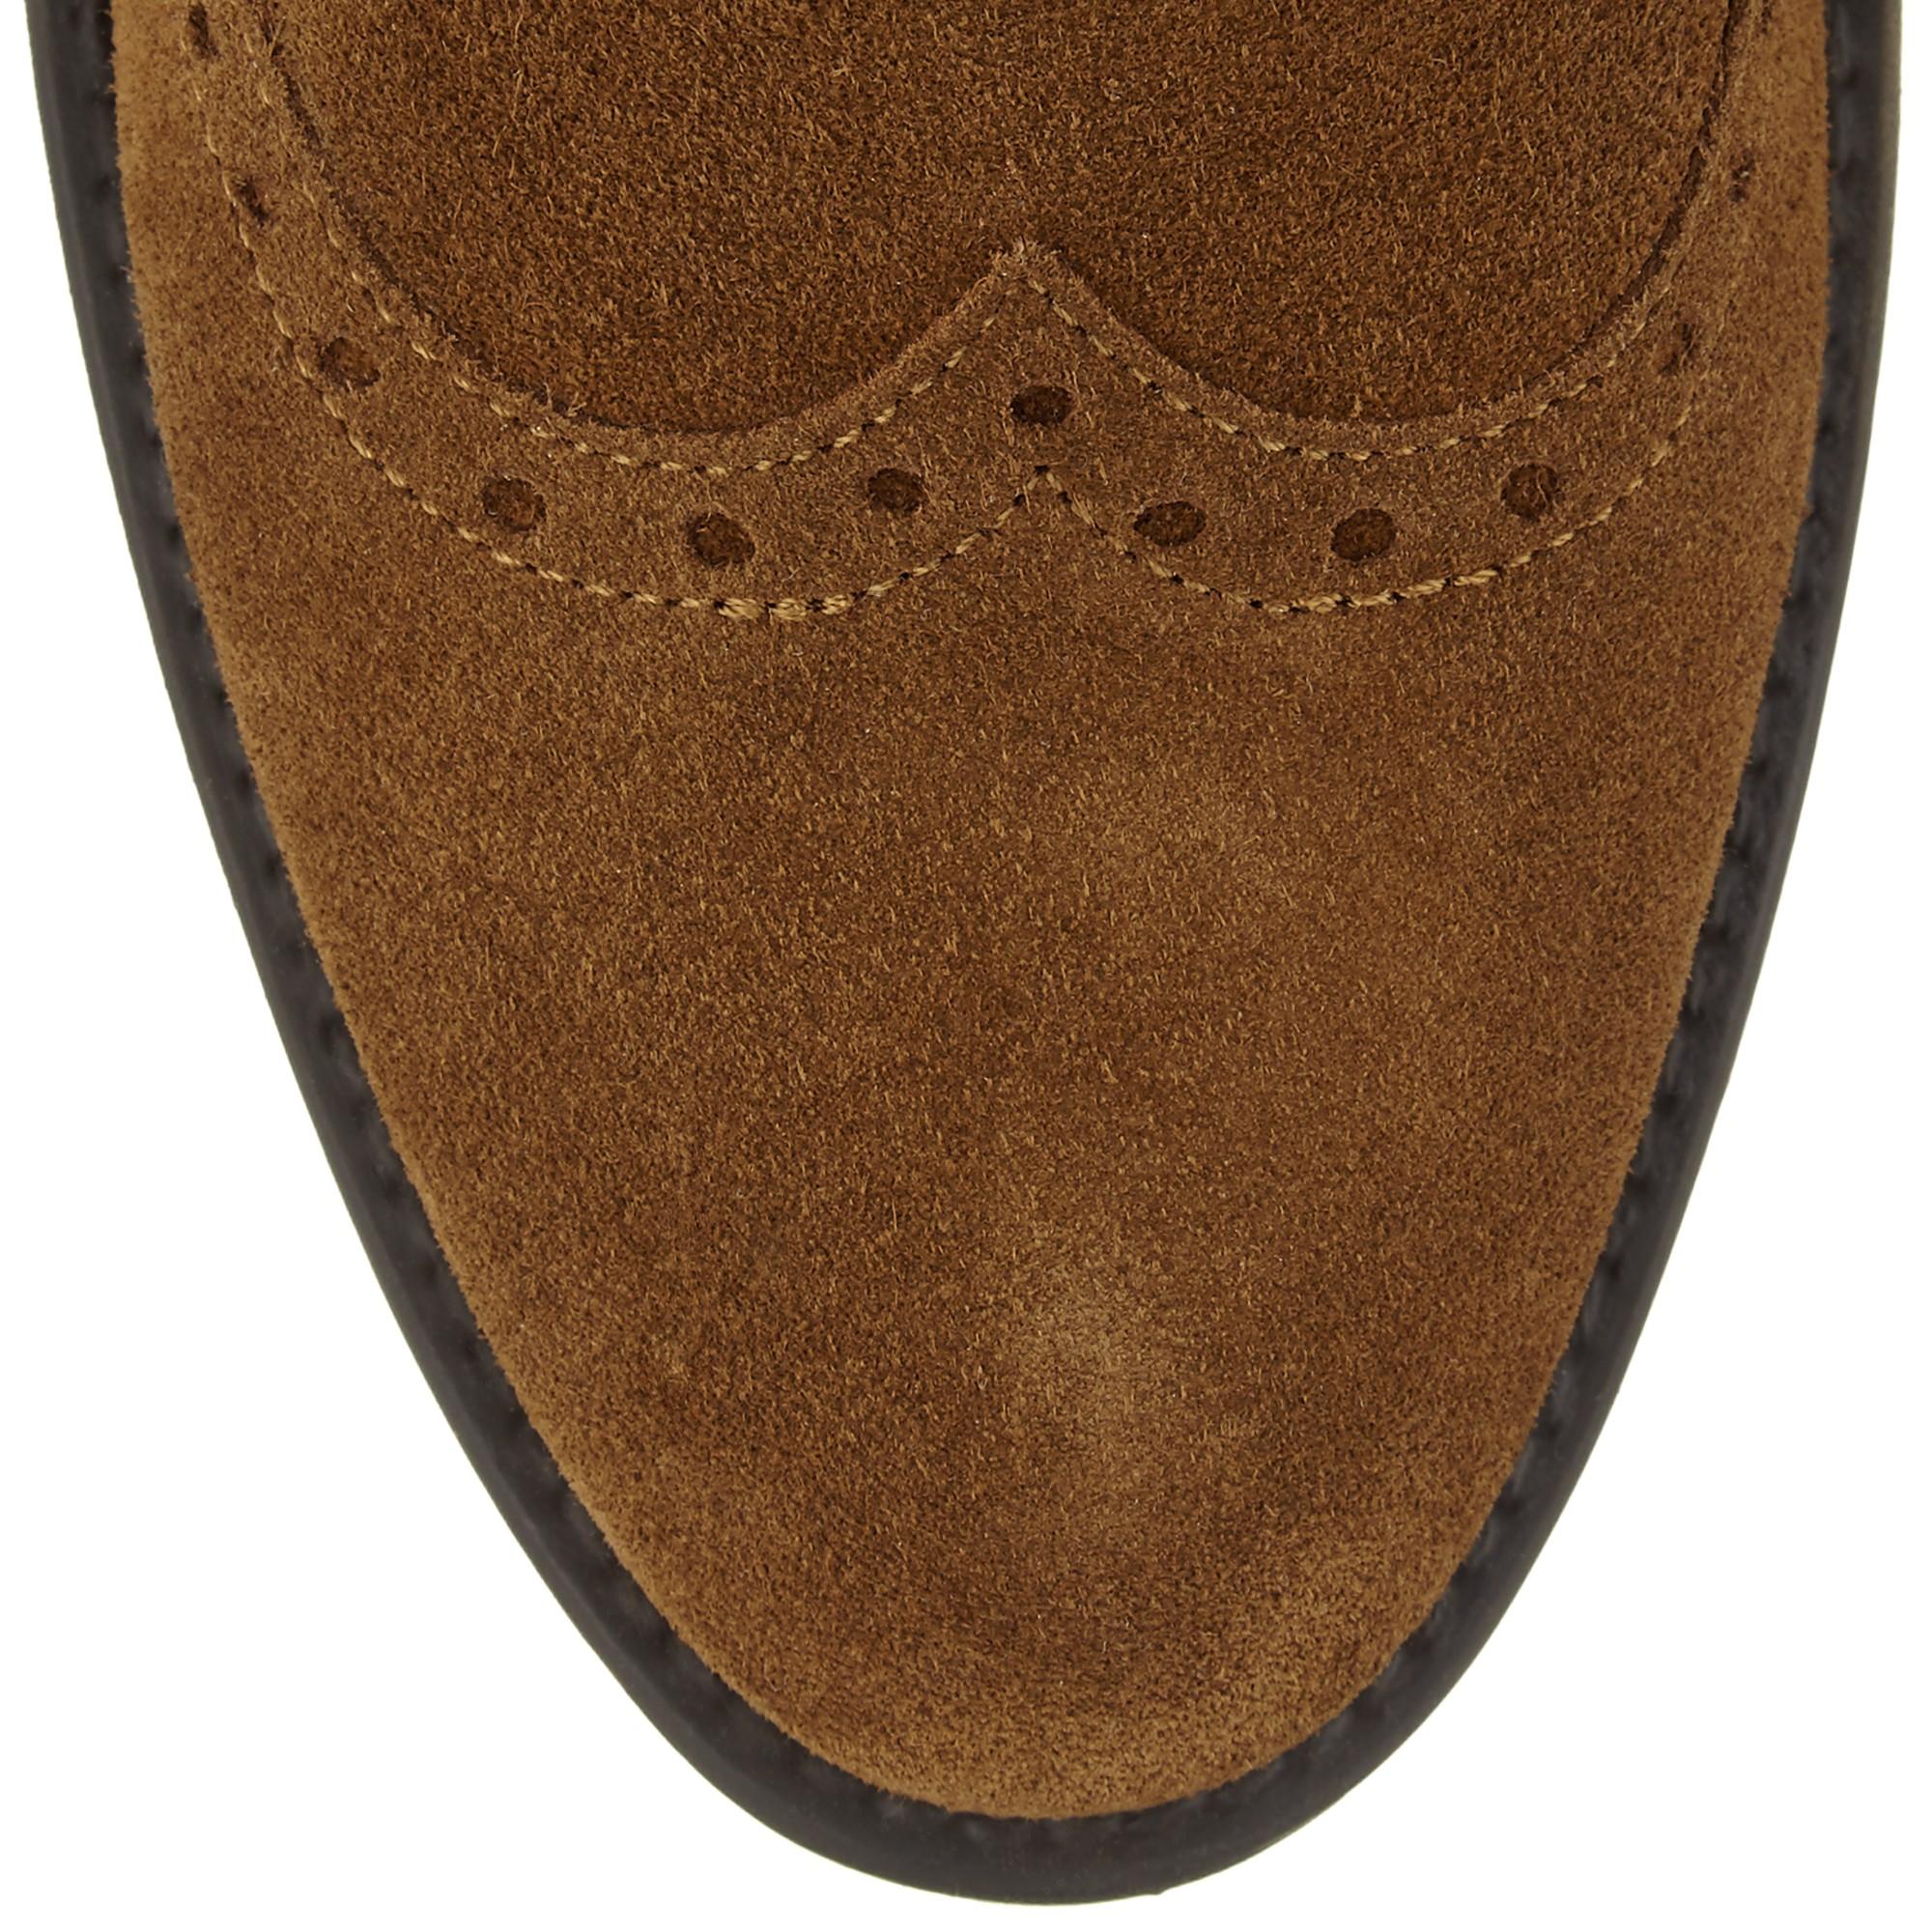 John Lewis Denim Trieste Flat Chelsea Ankle Boots in Tobacco Suede (Brown)